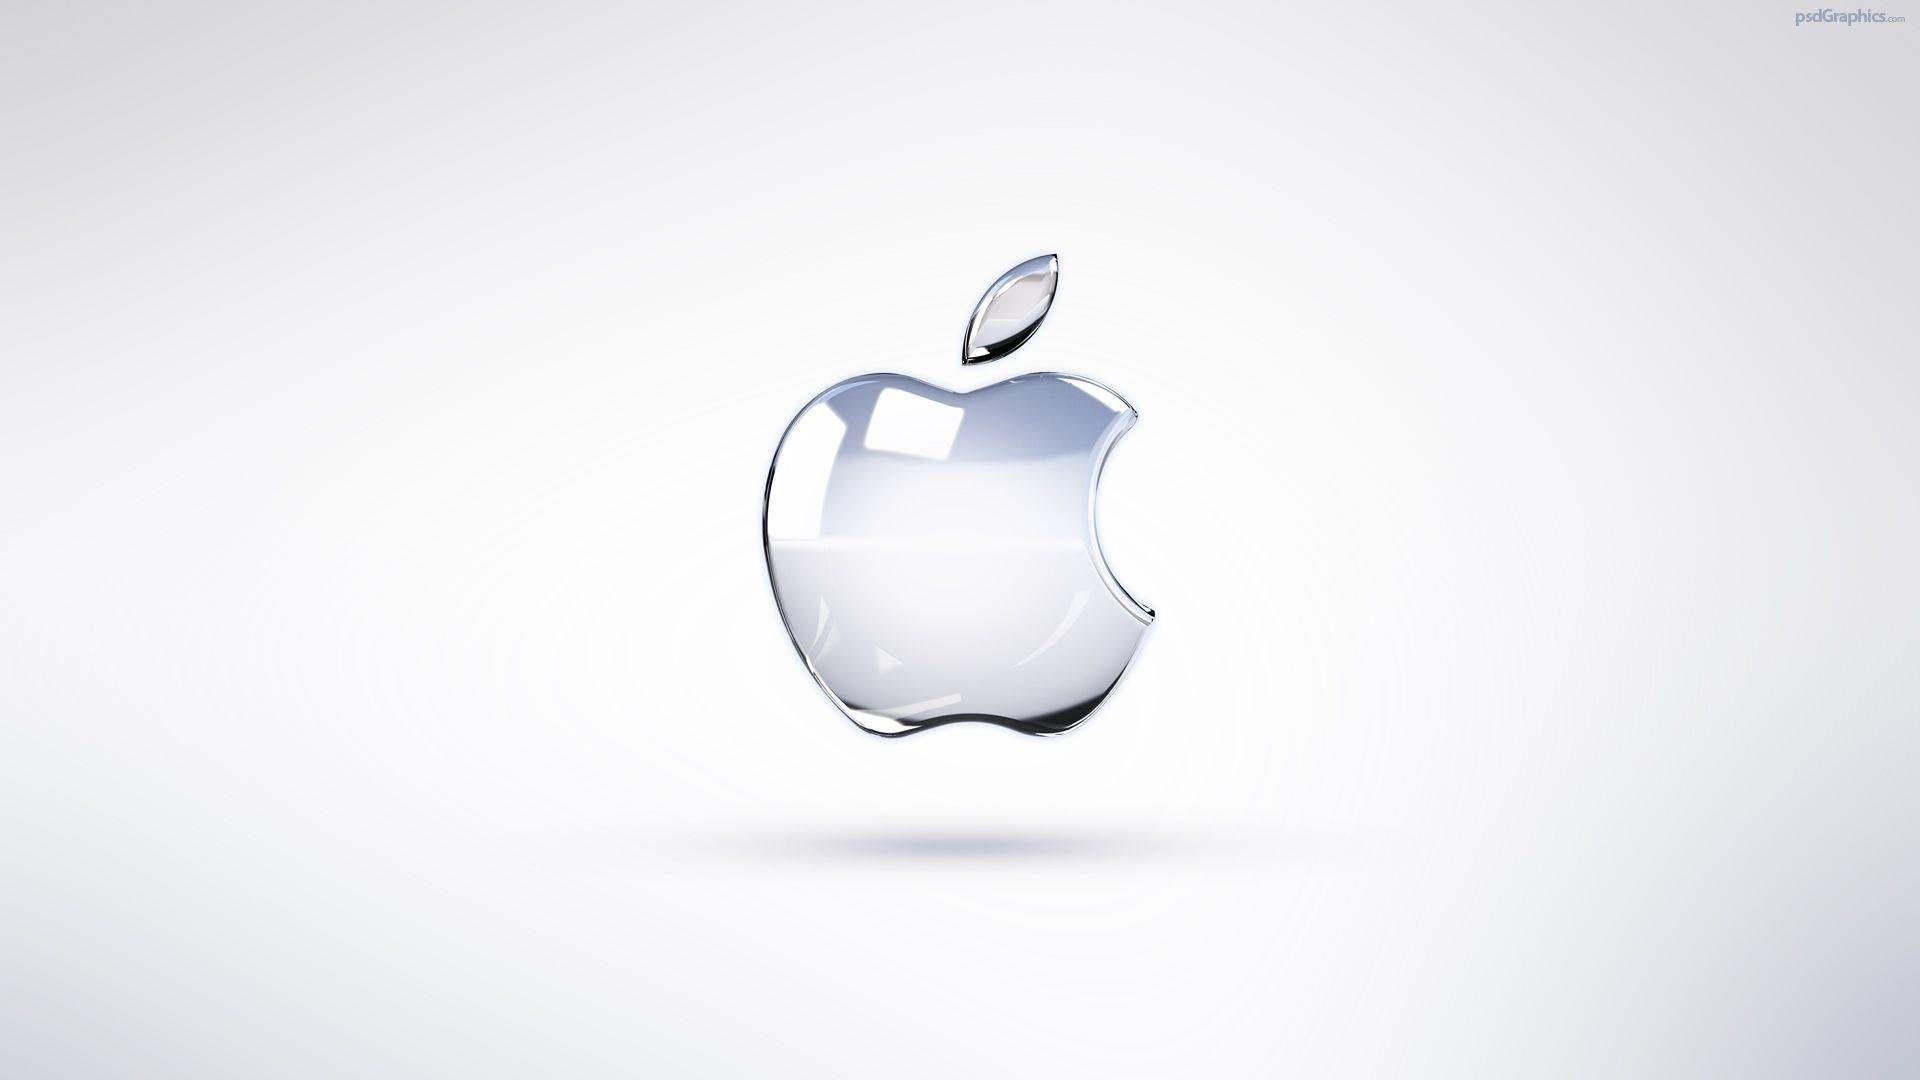 Apple Hd Wallpapers Apple Logo Desktop Backgrounds Page 1920